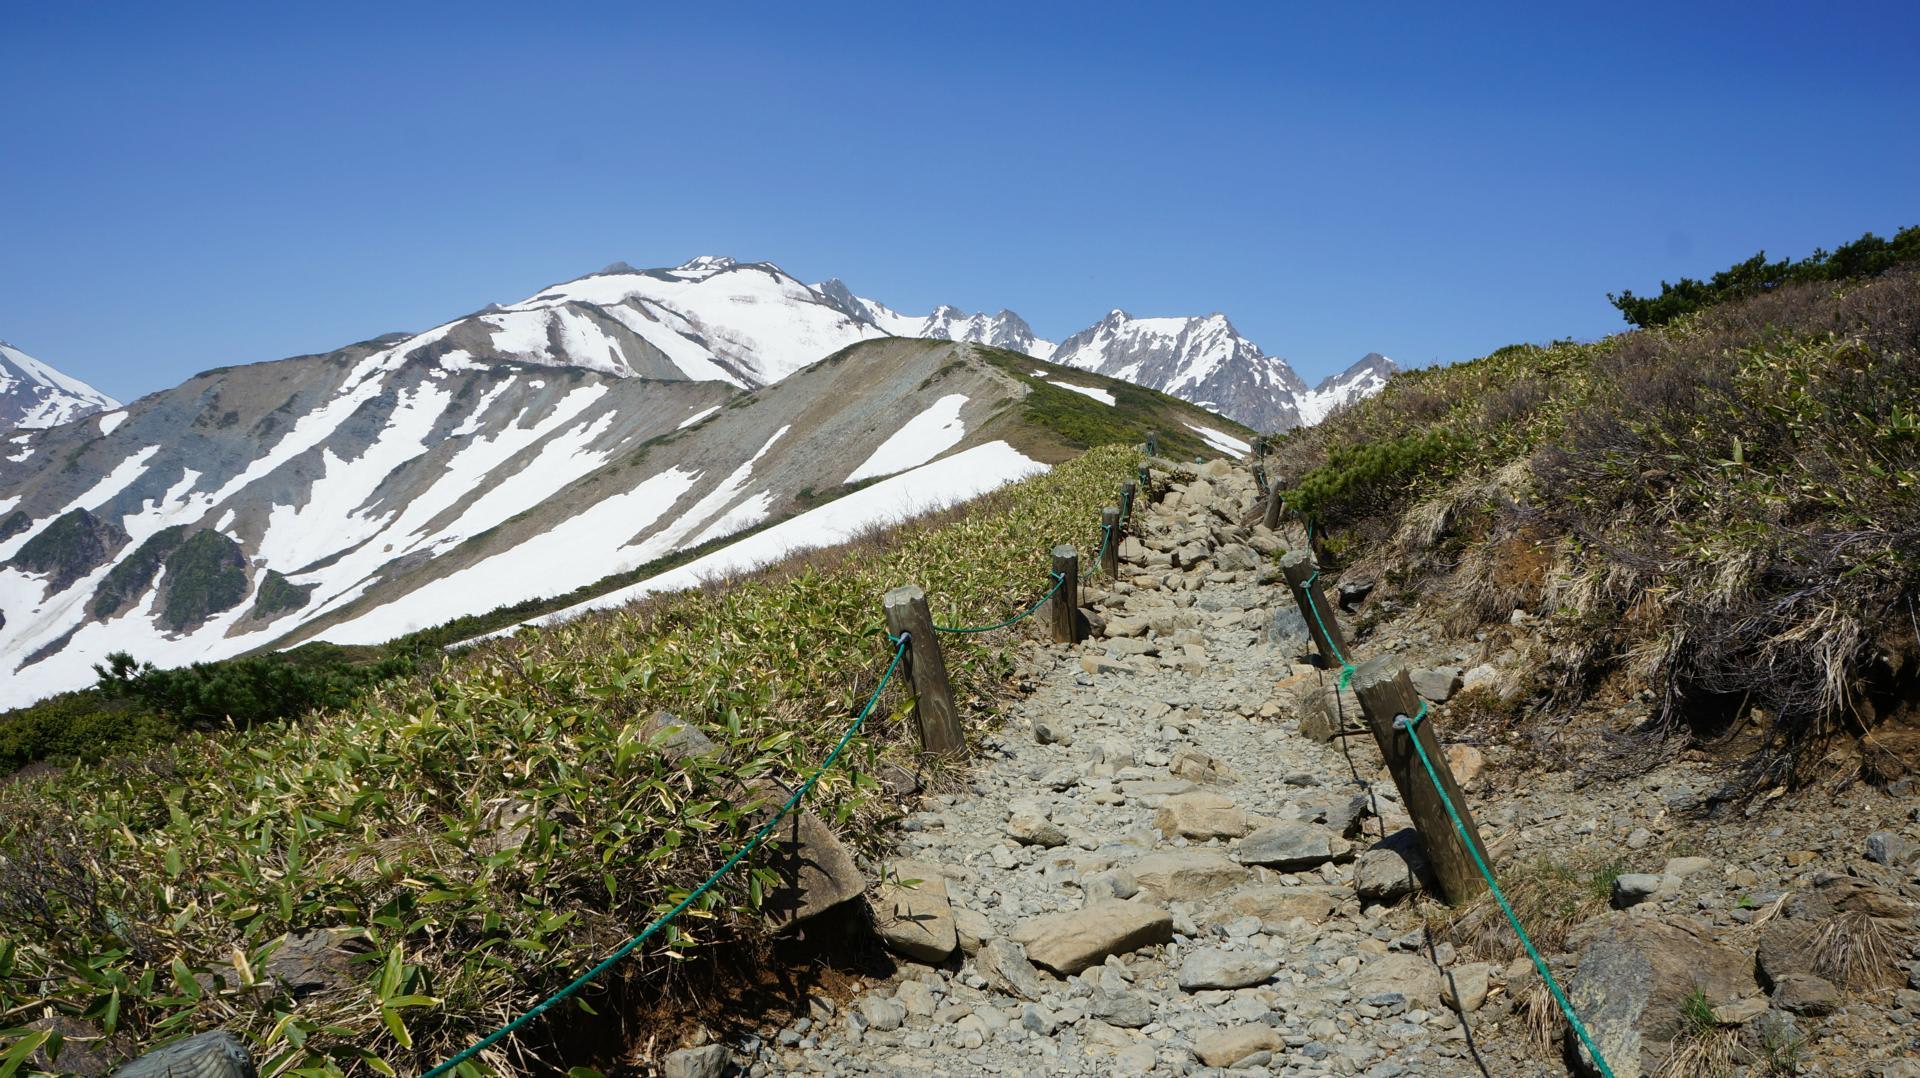 残雪の唐松岳 - acc-j 茨城 山岳会日記